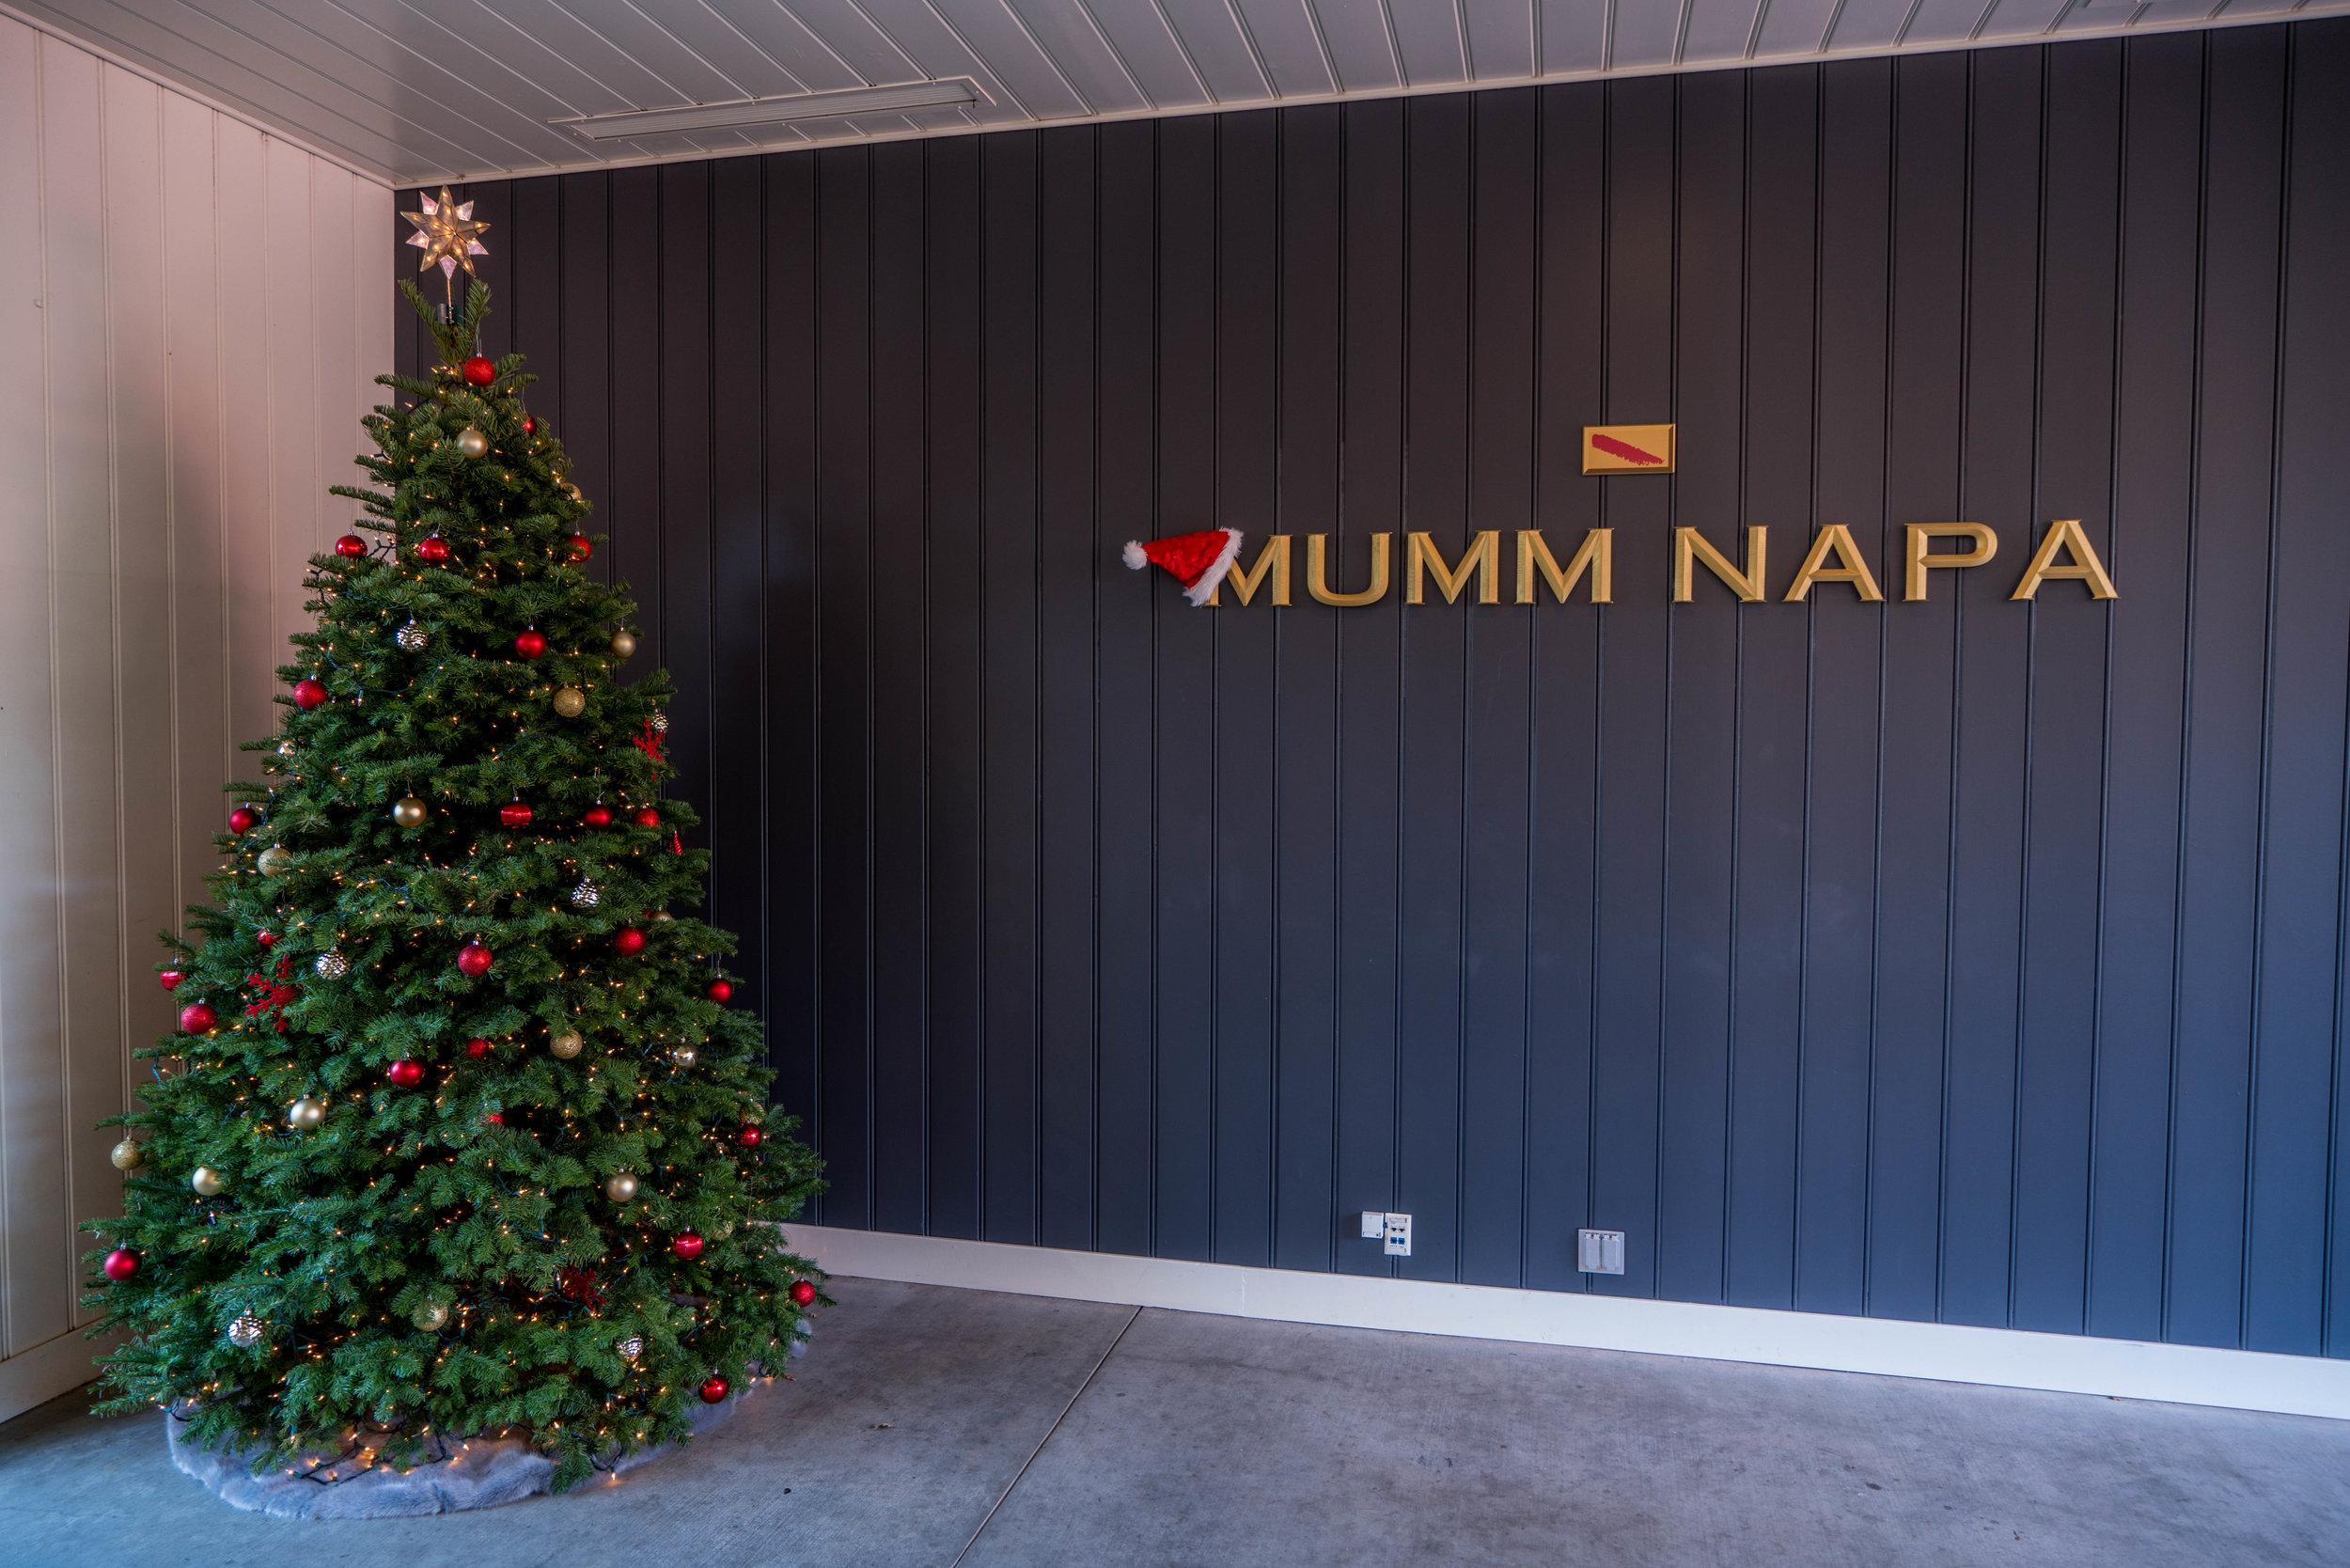 Copy of Mumm Napa Champagne Wine Tasting